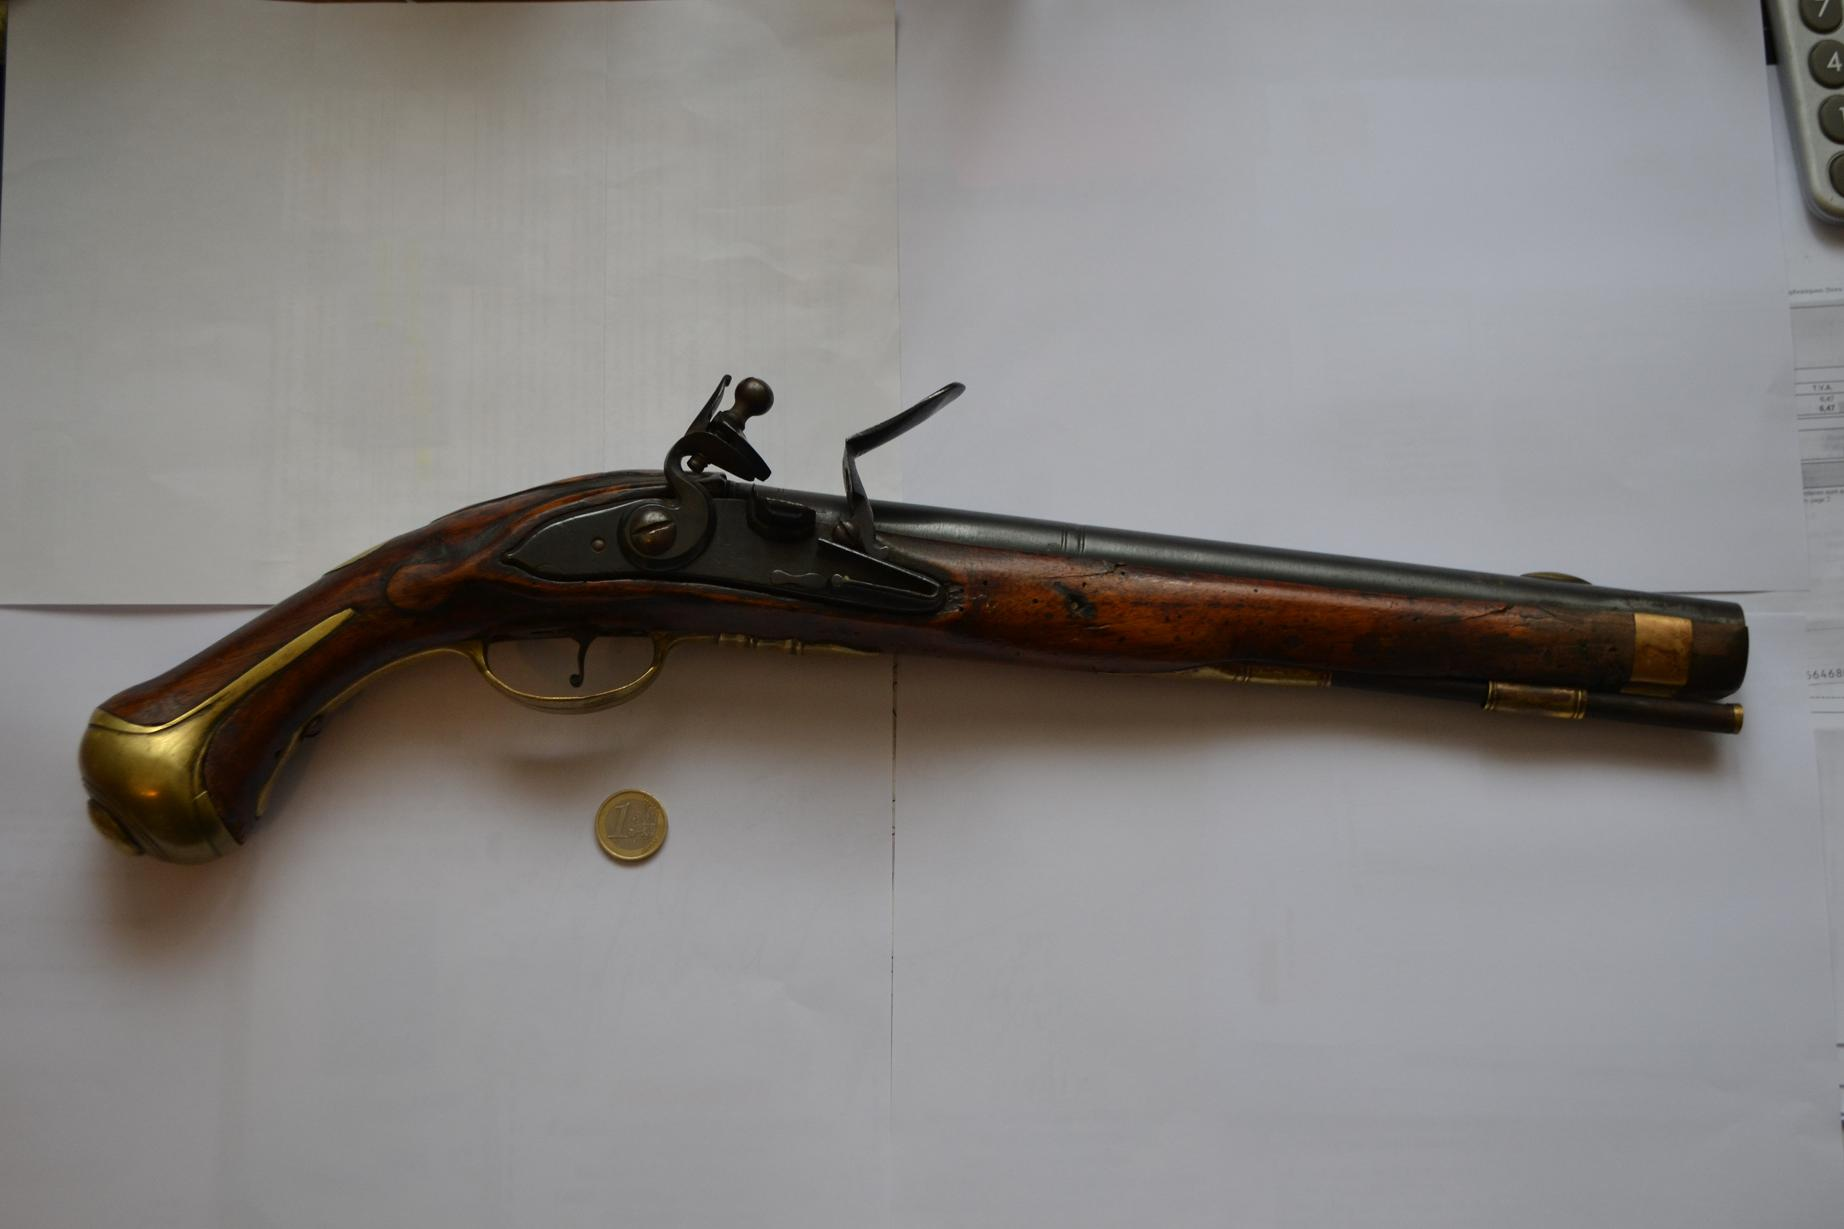 Pistolet début XVIIIeme? 870681DSC1289